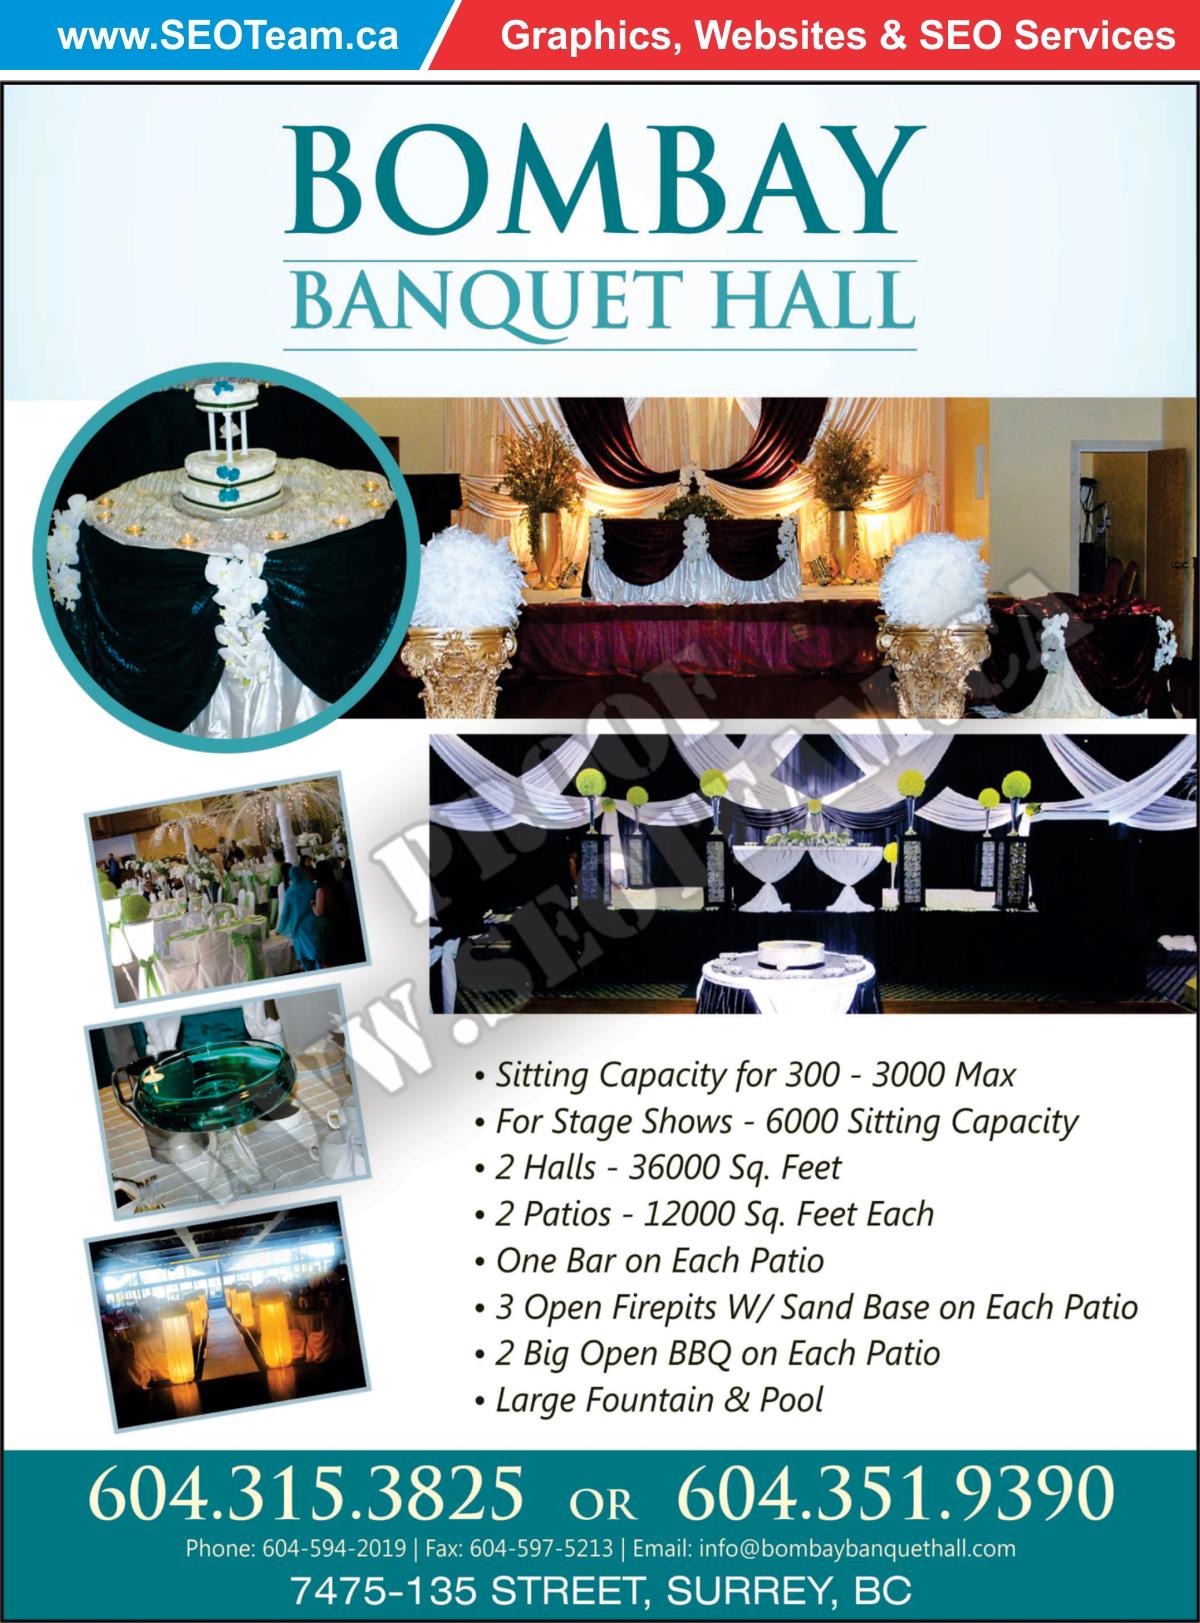 bombay banquet hall design by seoteam ca seo web design